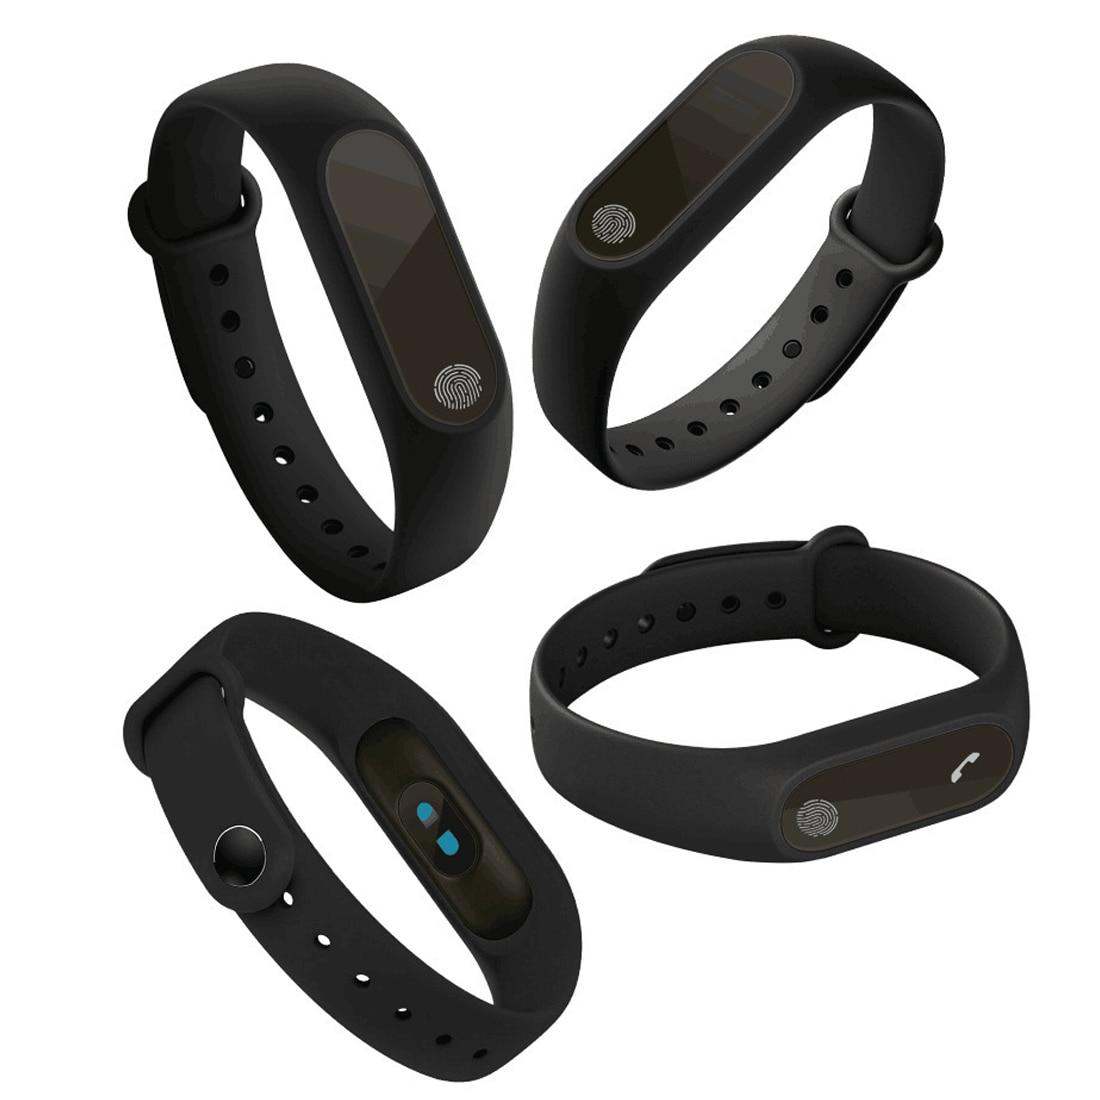 цена на Hot Sale Running Step Calorie Counter Digital LCD Walking Pedometer Wrist Sport Fitness Watch Bracelet Display Sports Tracker